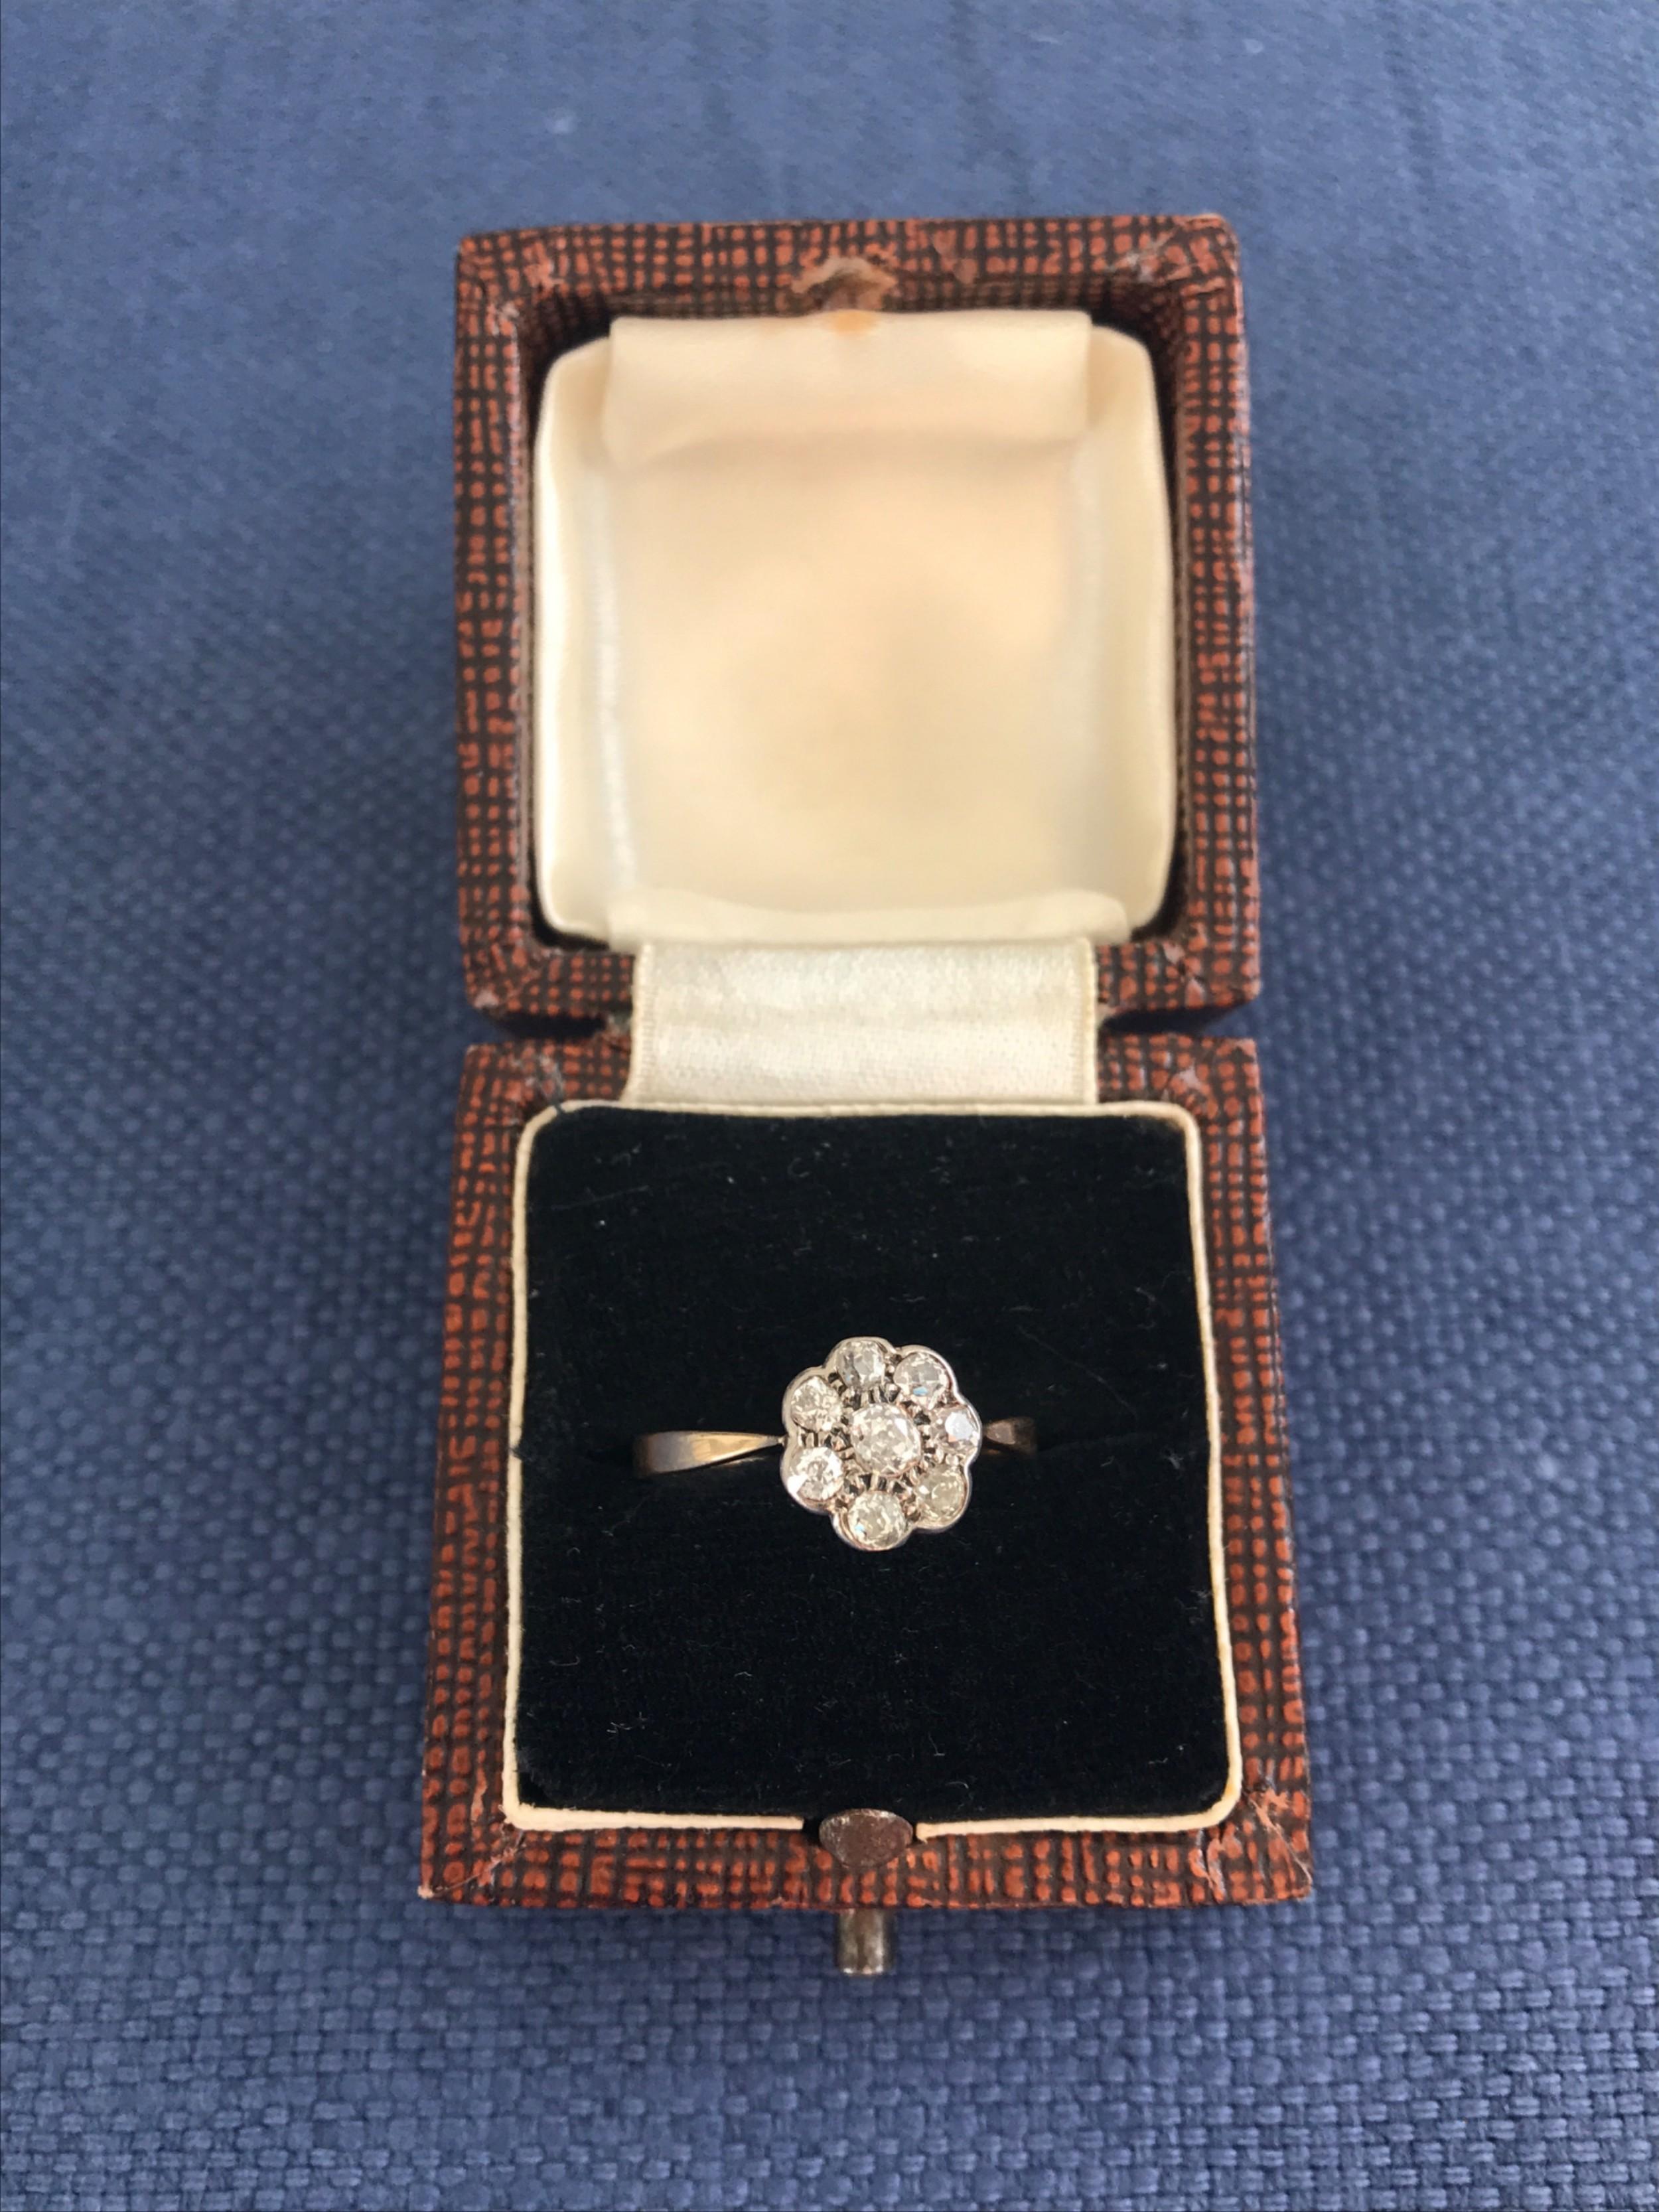 18ct diamond daisy ring